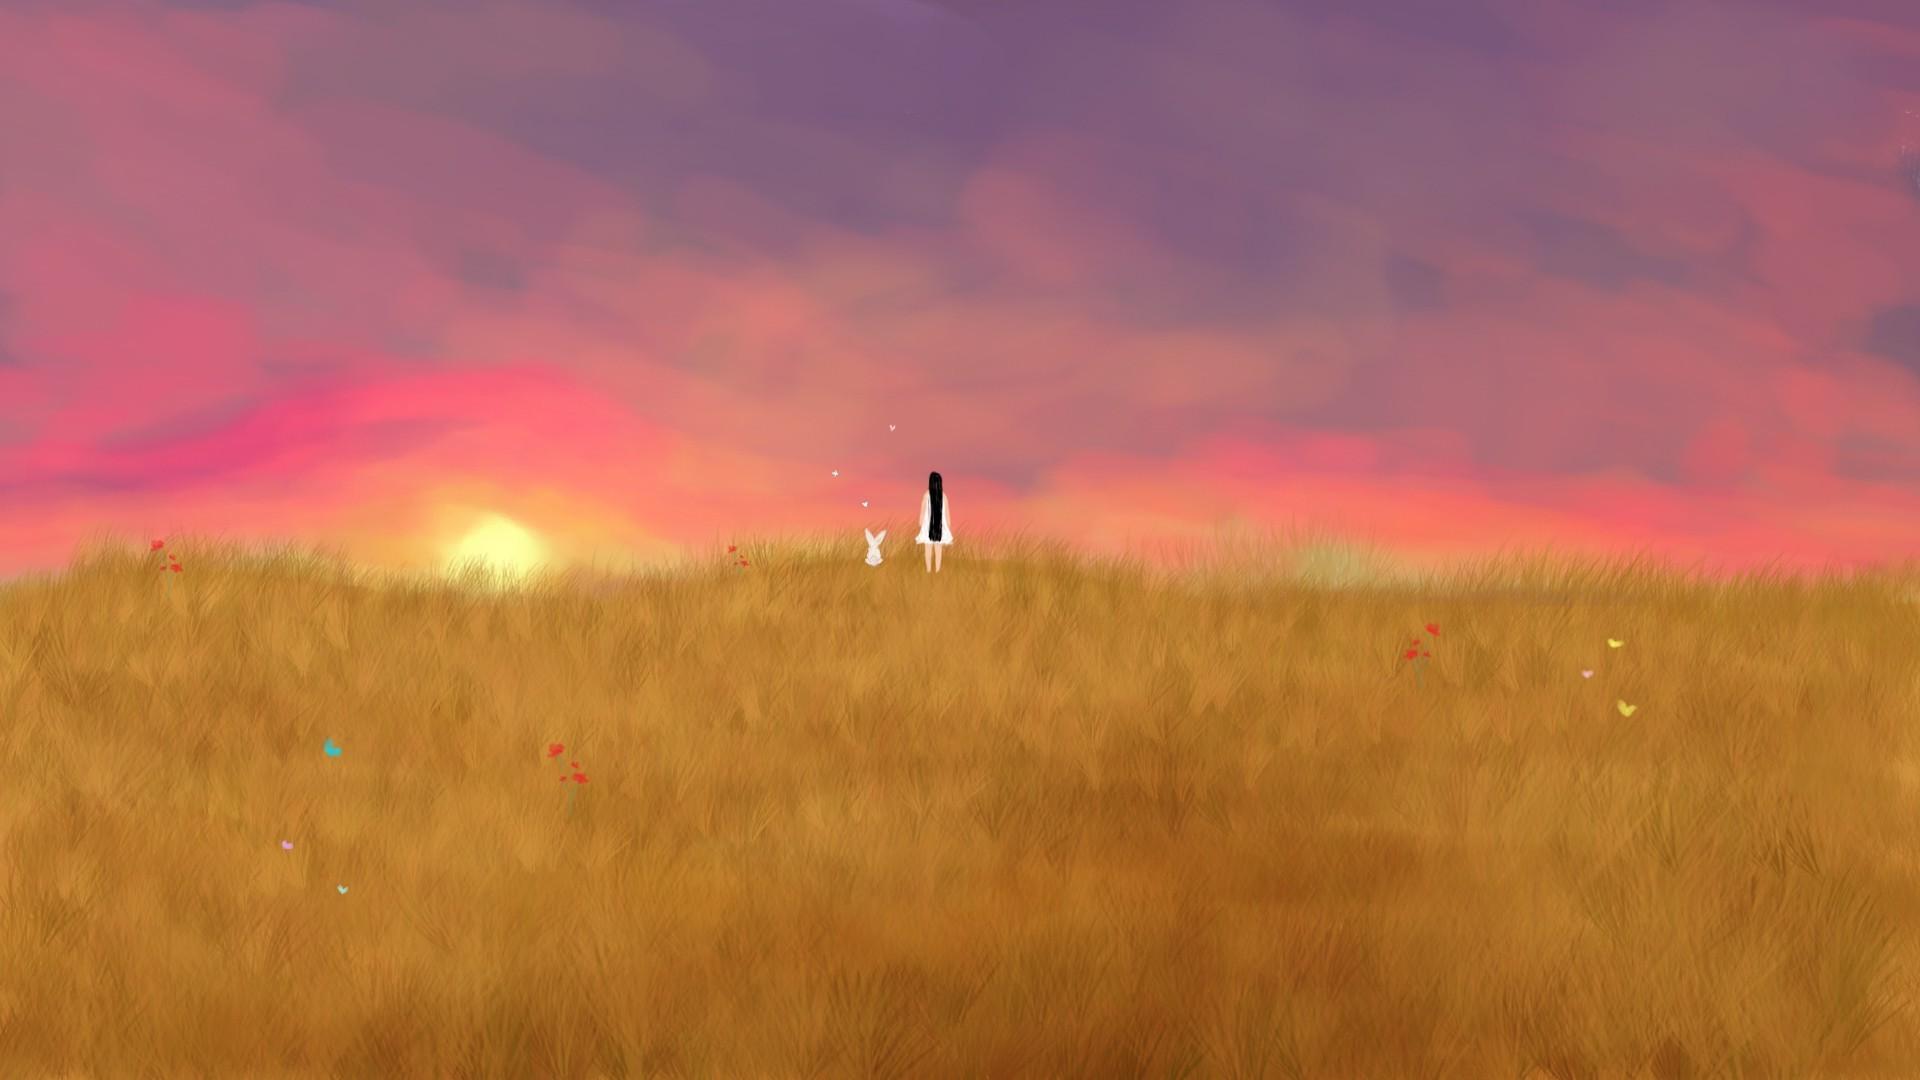 1920x1080 Wallpaper Sunlight, Drawing, Sunset, Hill, Sky, Field, Sunrise